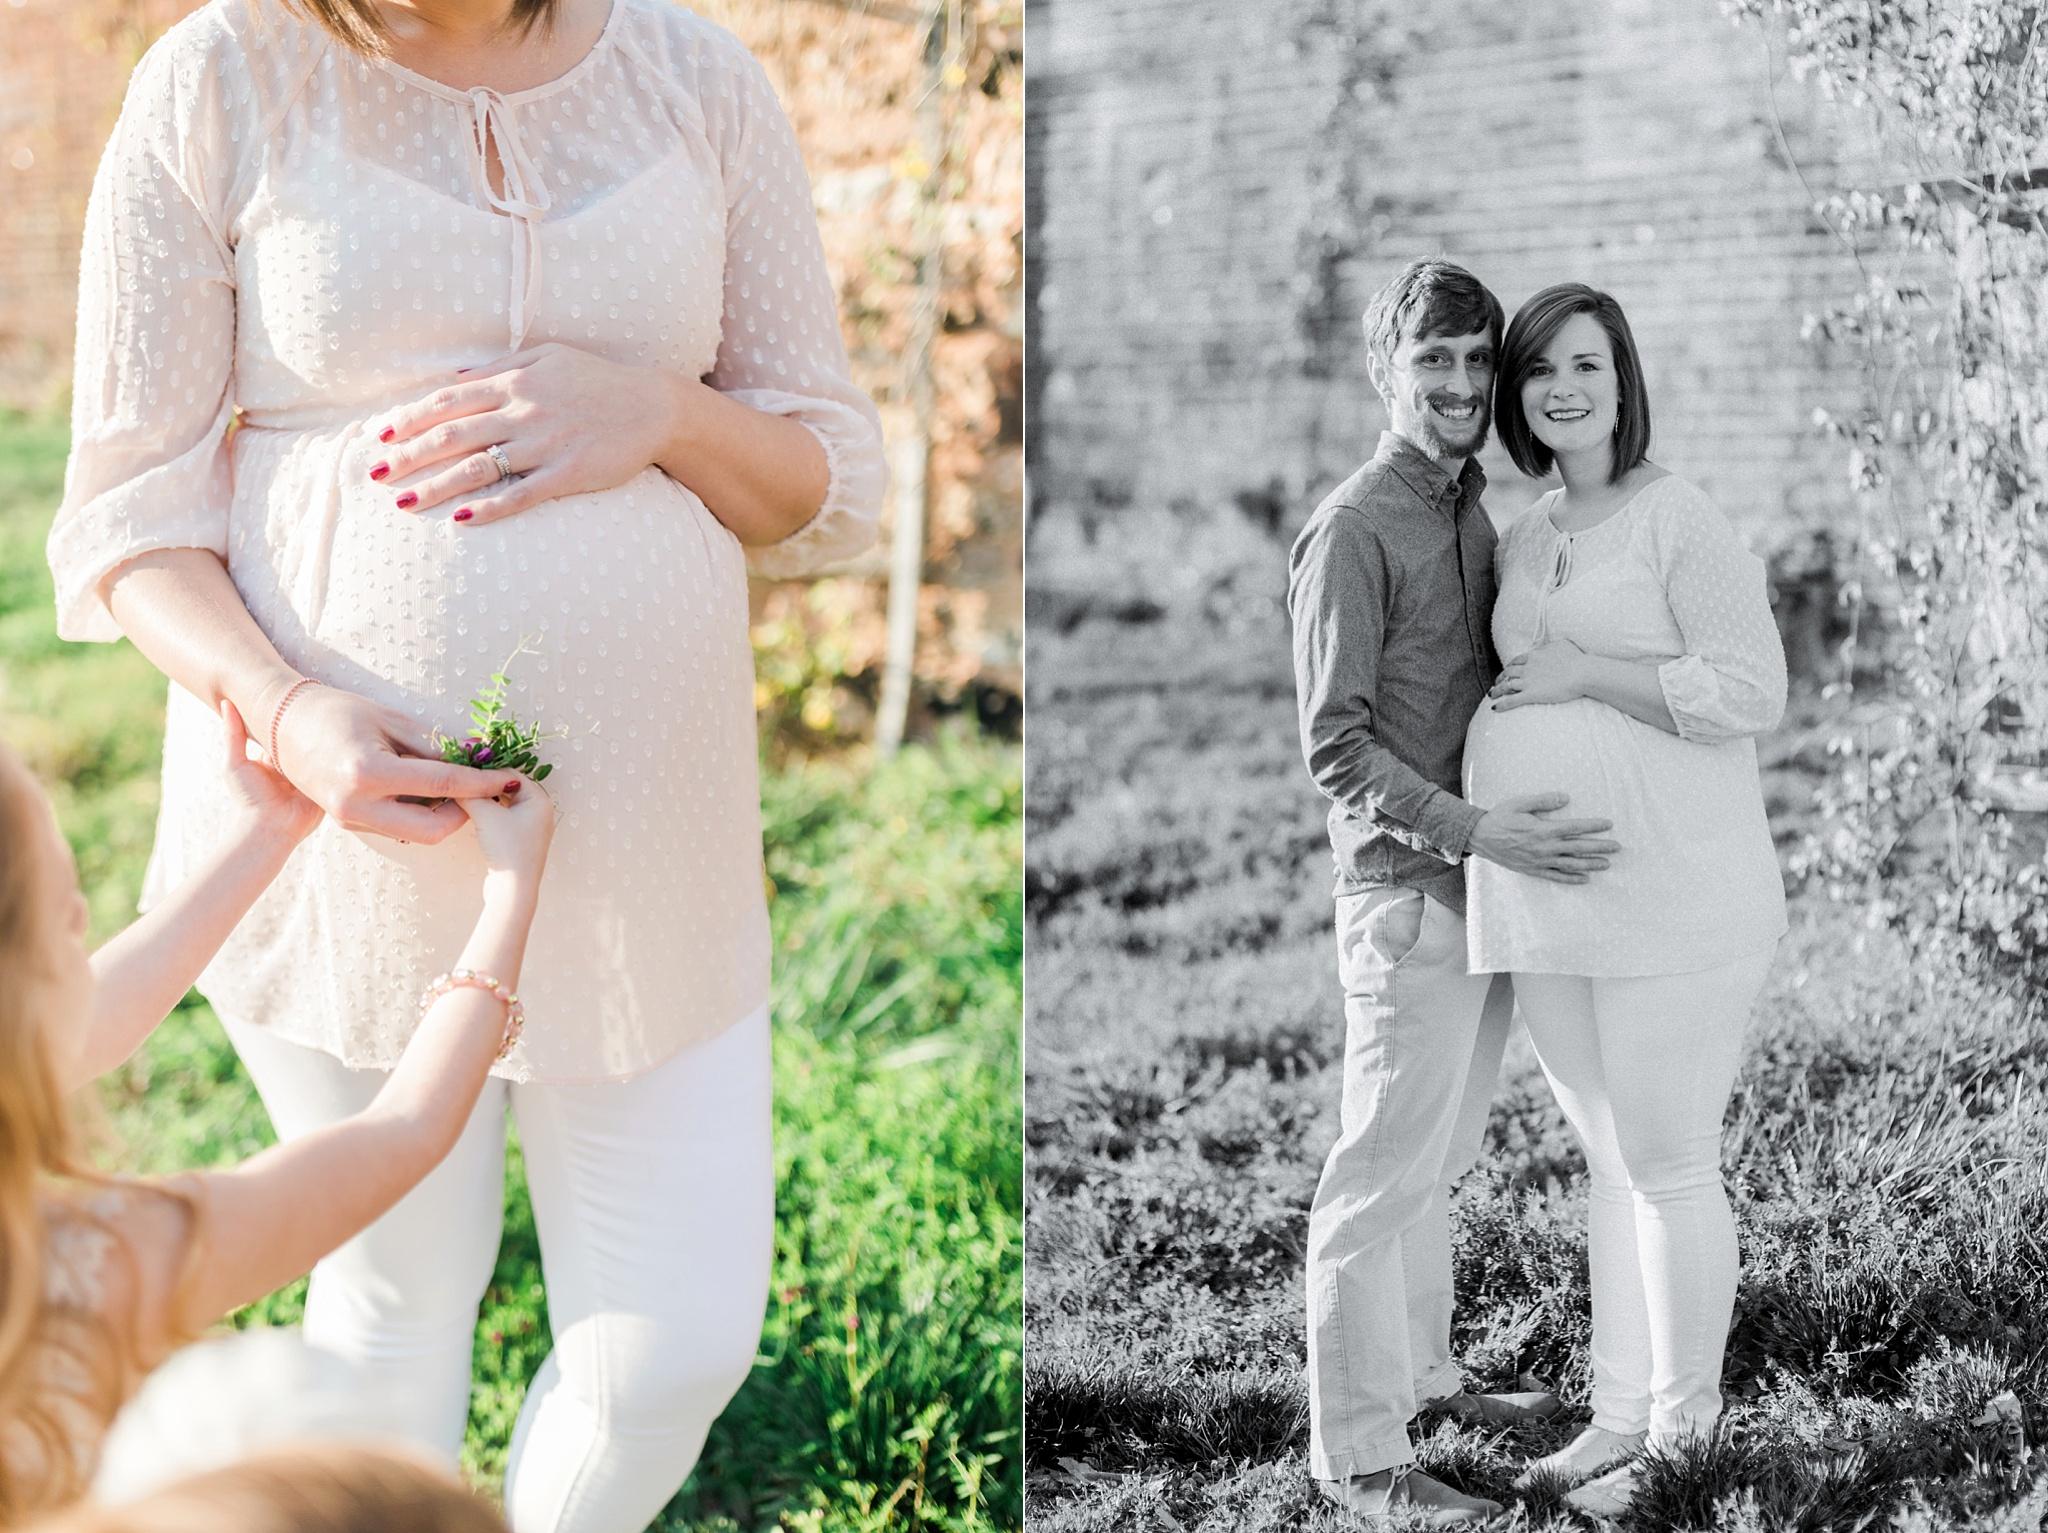 senoia-georgia-maternity-motherhood-photographer-moorebaby3-37.jpg